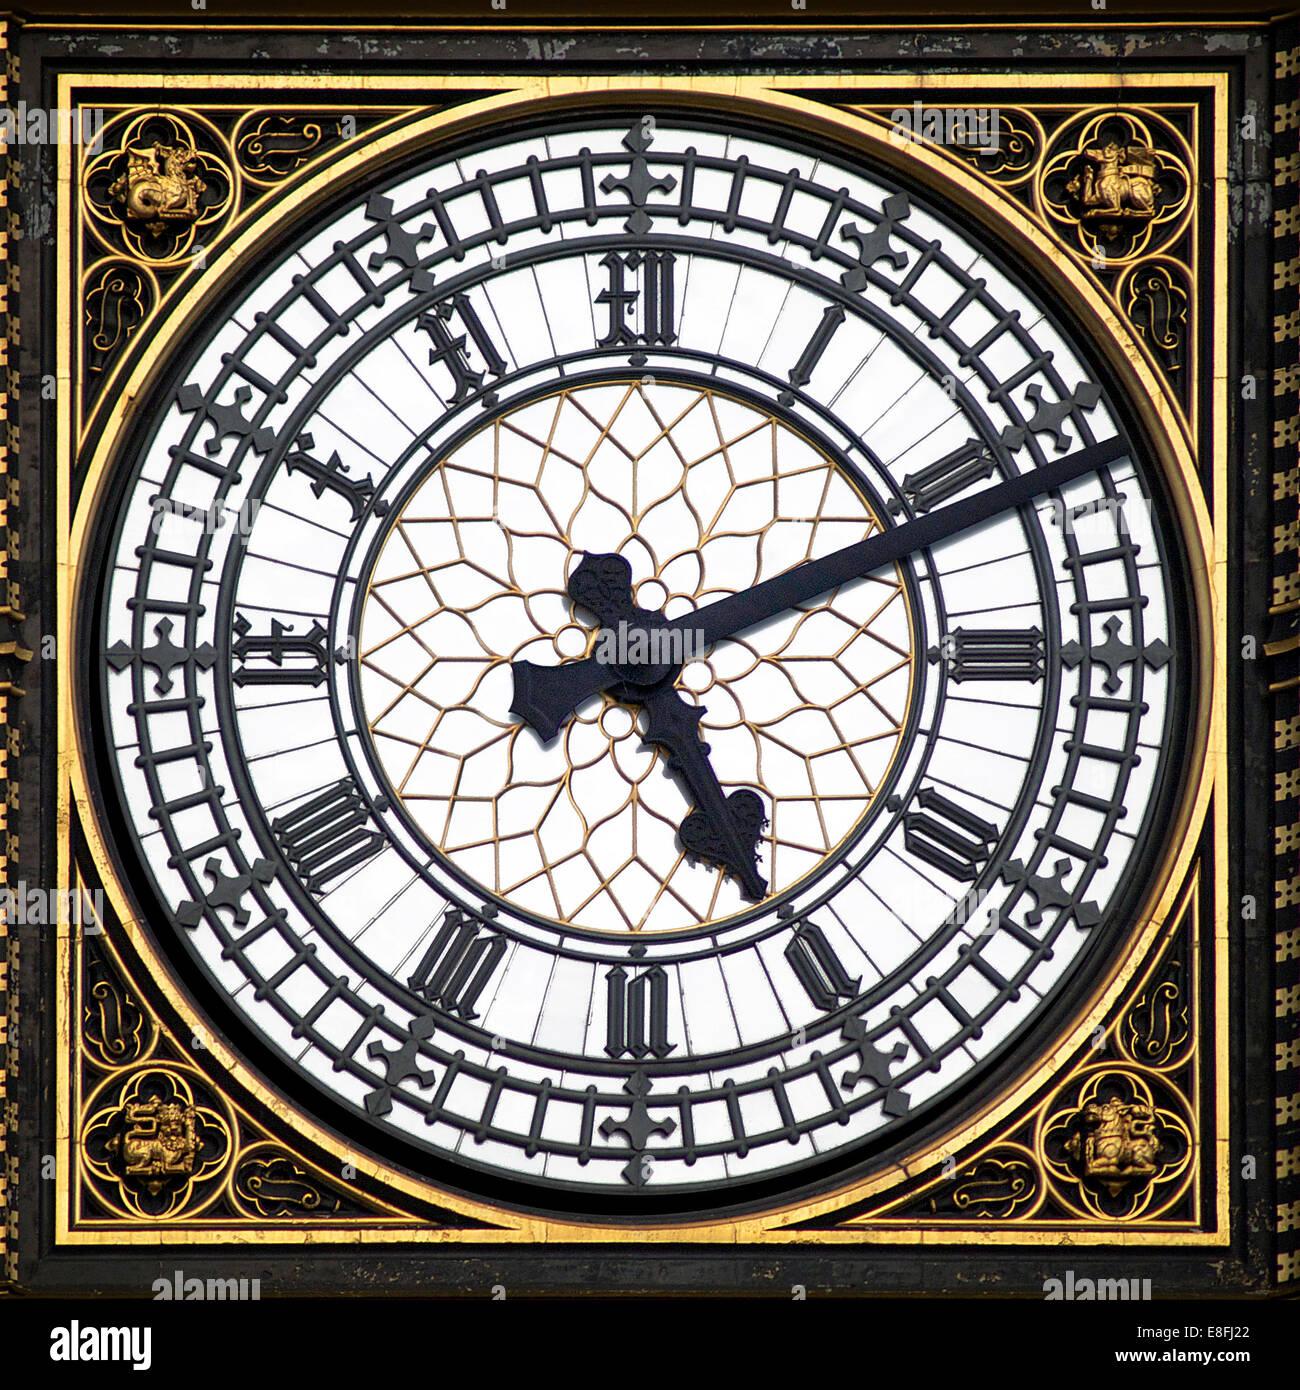 Big Ben horloge, London, England, UK Photo Stock